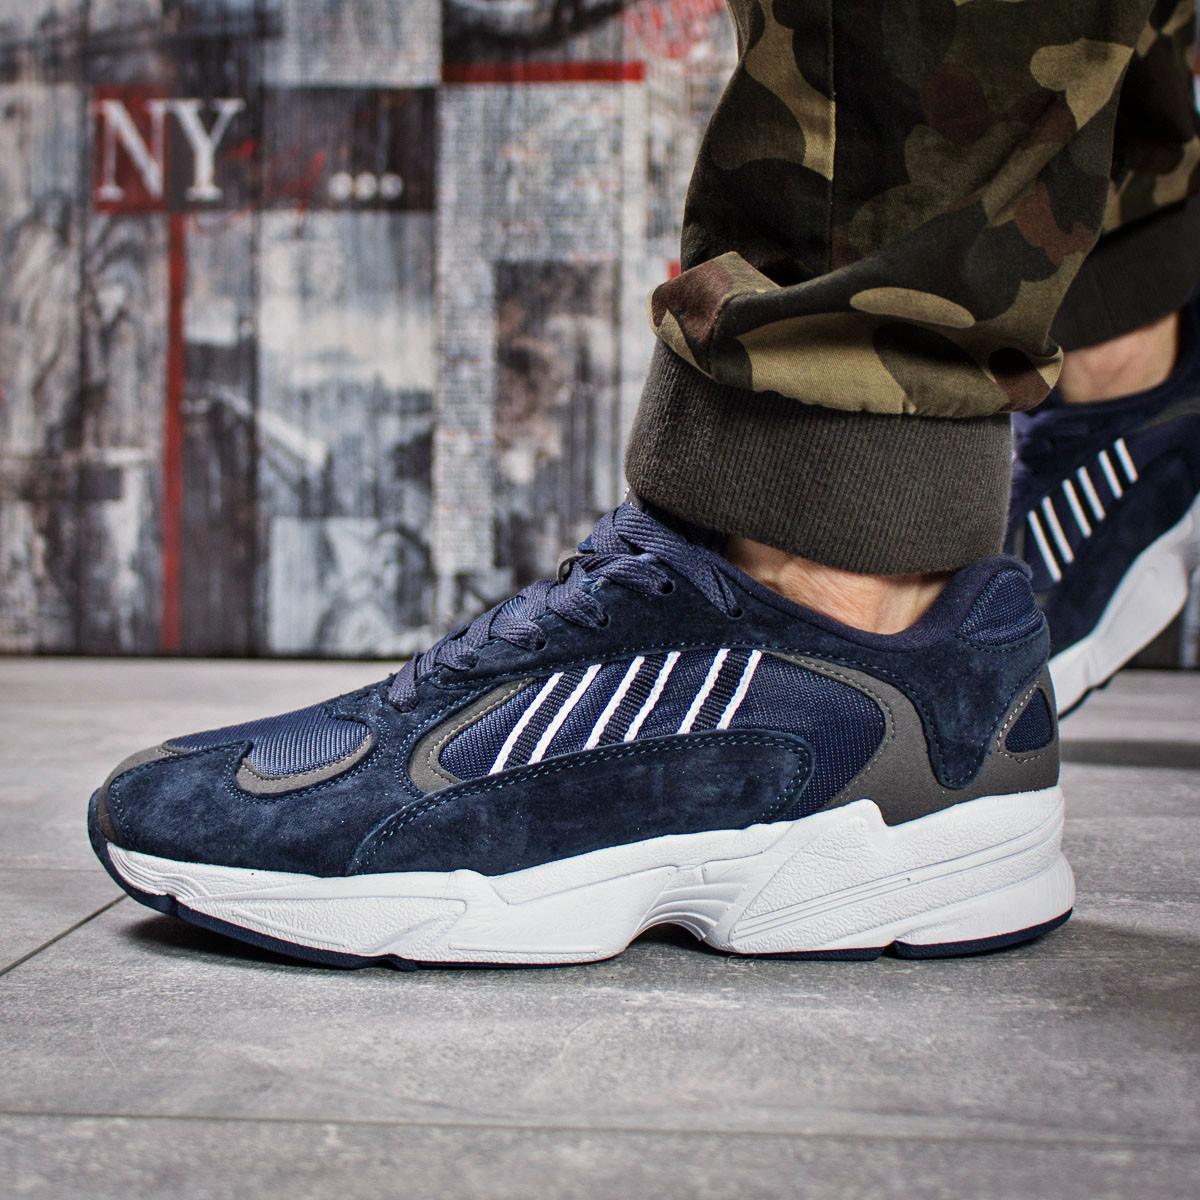 Кроссовки мужские 15933, Adidas Yung 1, темно-синие, < 45 46 > р. 45-29,5см.